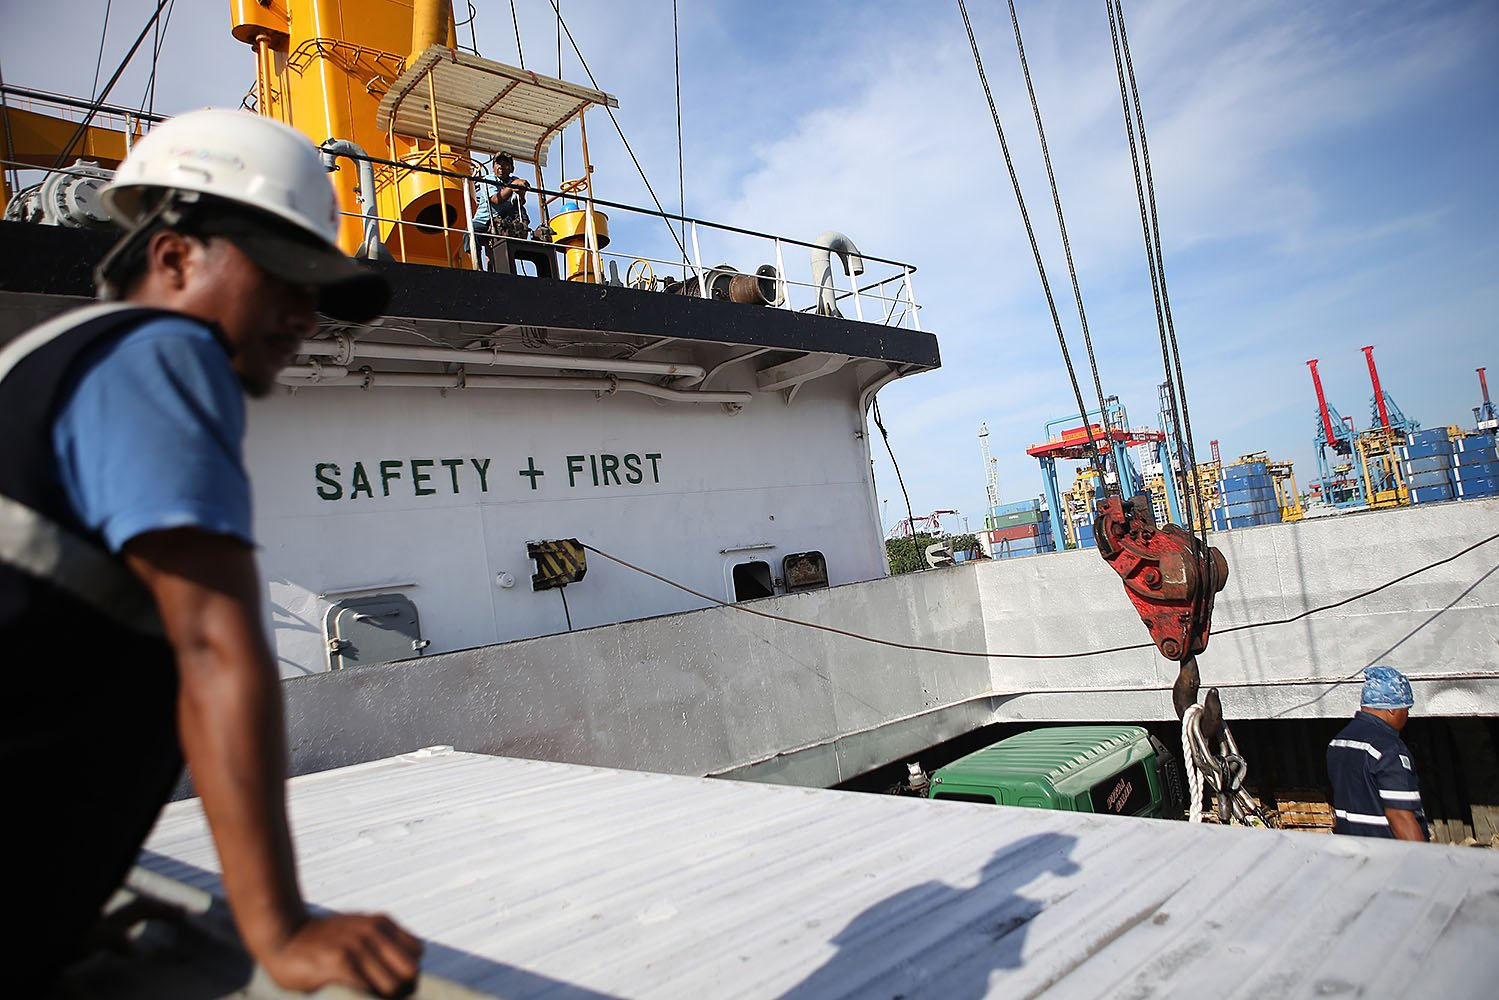 Kapal logistik yang digagas Kementerian Perhubungan ini dengan skema kerjasama sinergi Badan Usaha Milik Negara (BUMN).